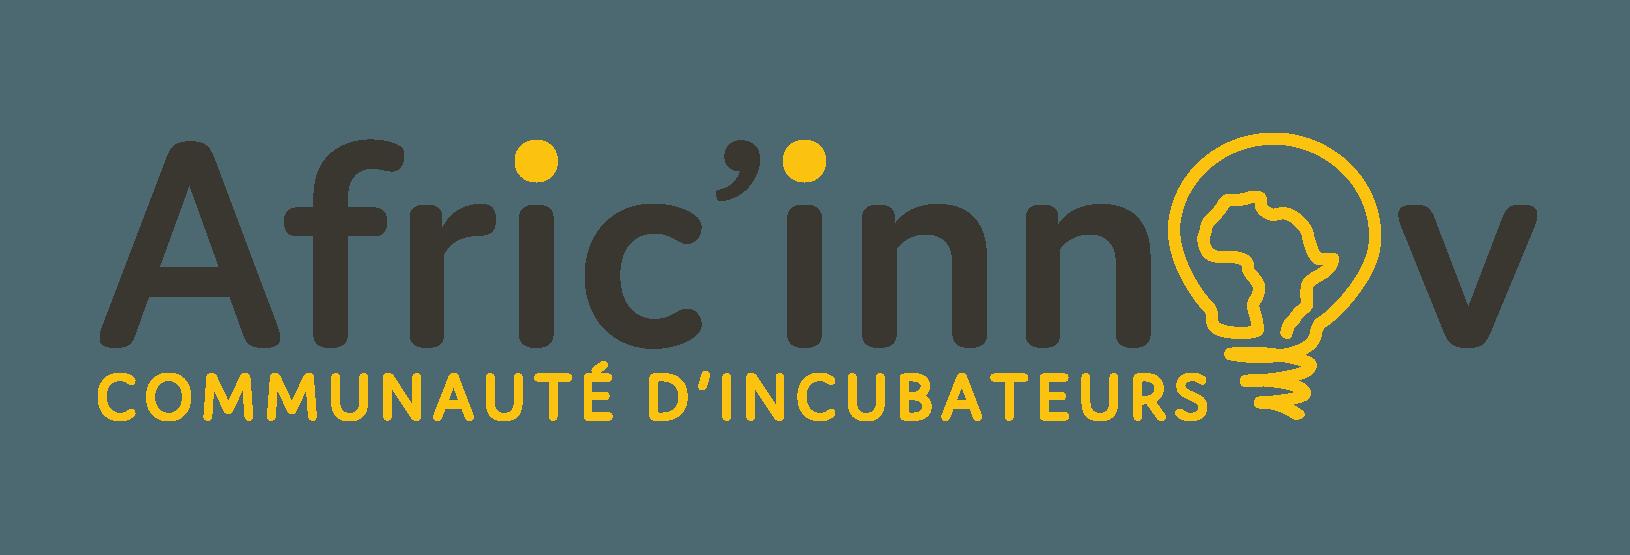 Afric'innov – France et 22 pays africains